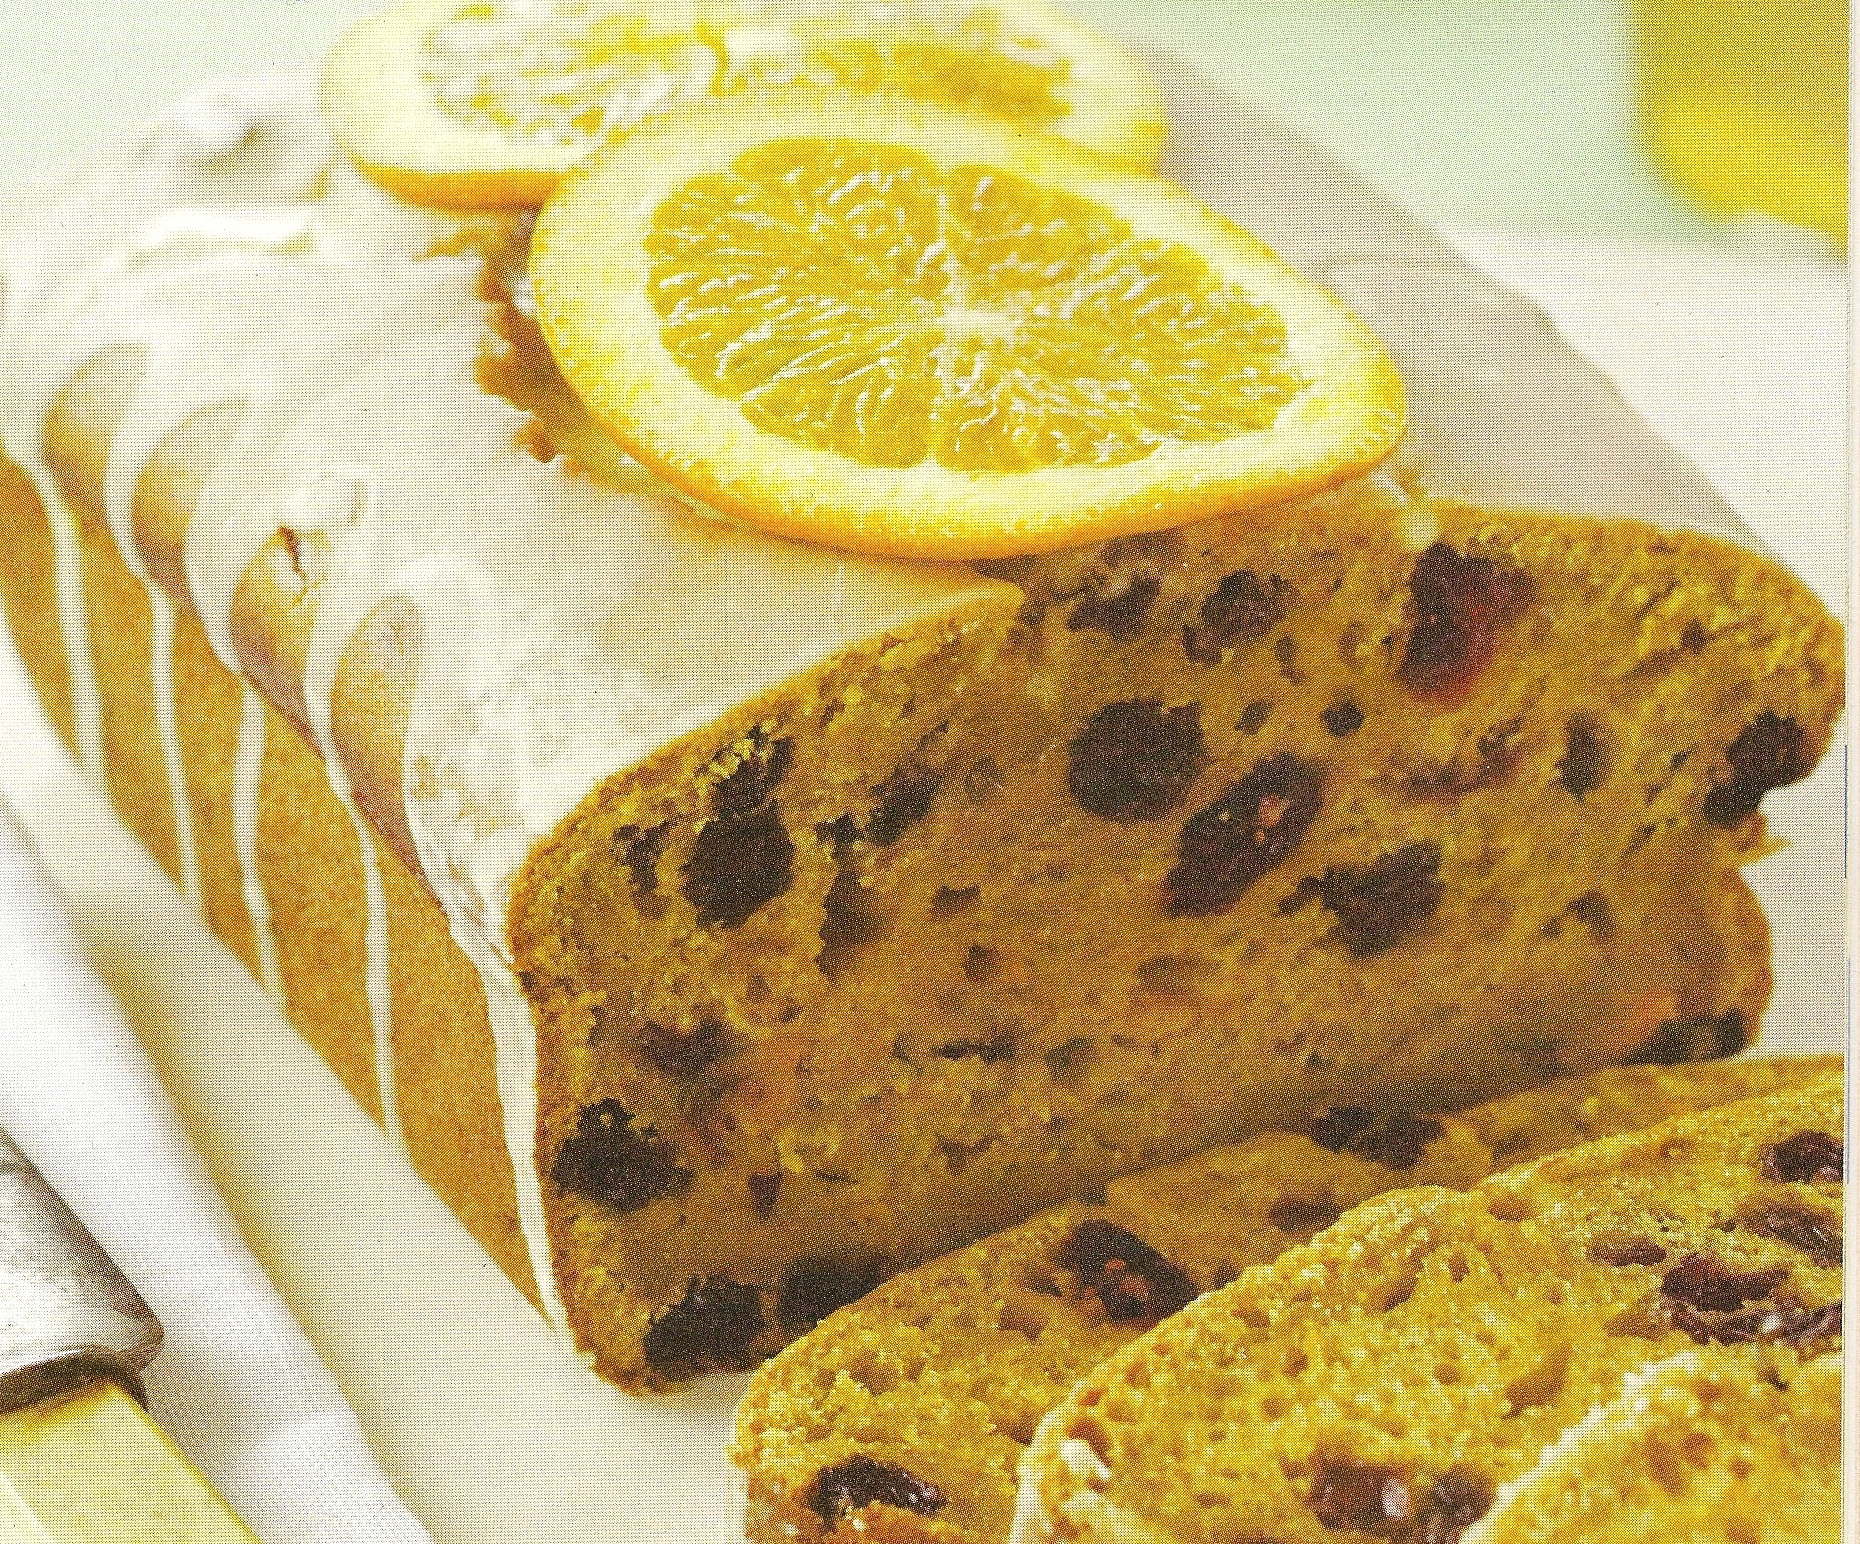 sweet-potato-coffe-cake.jpg